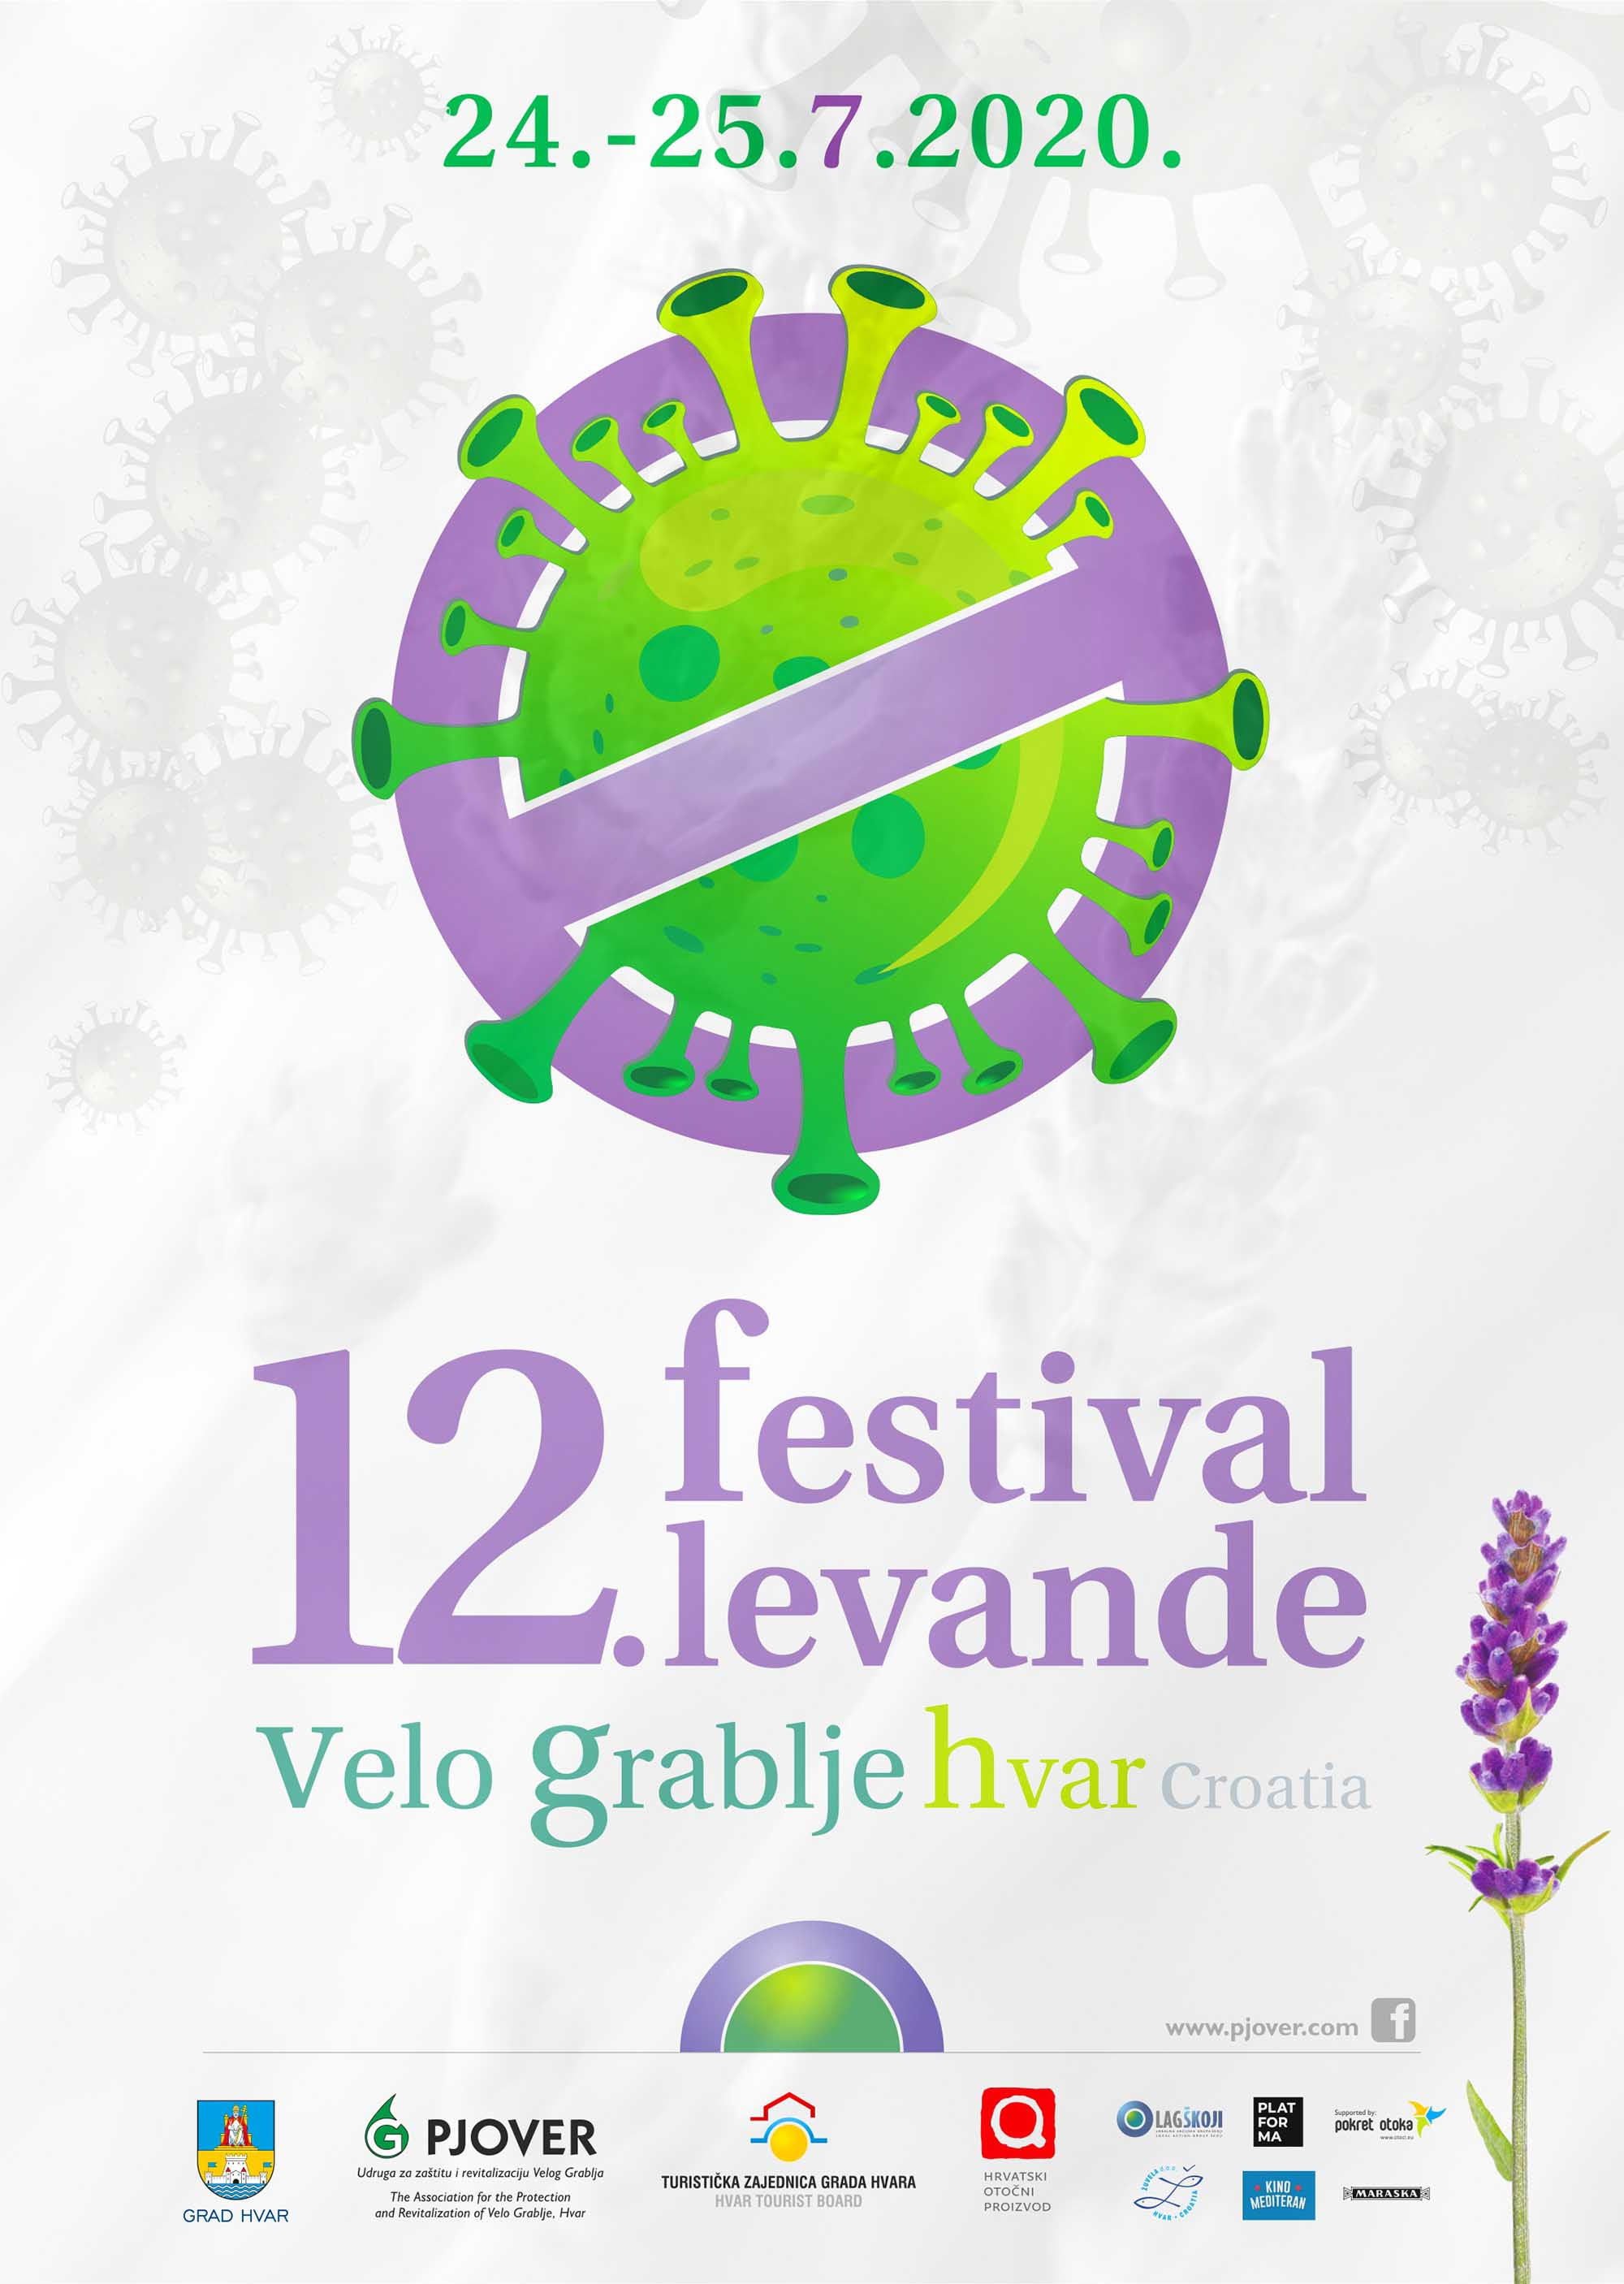 Predstavljanje platforme O-kupi otok na 12. Festivalu Levande u Velom Grablju